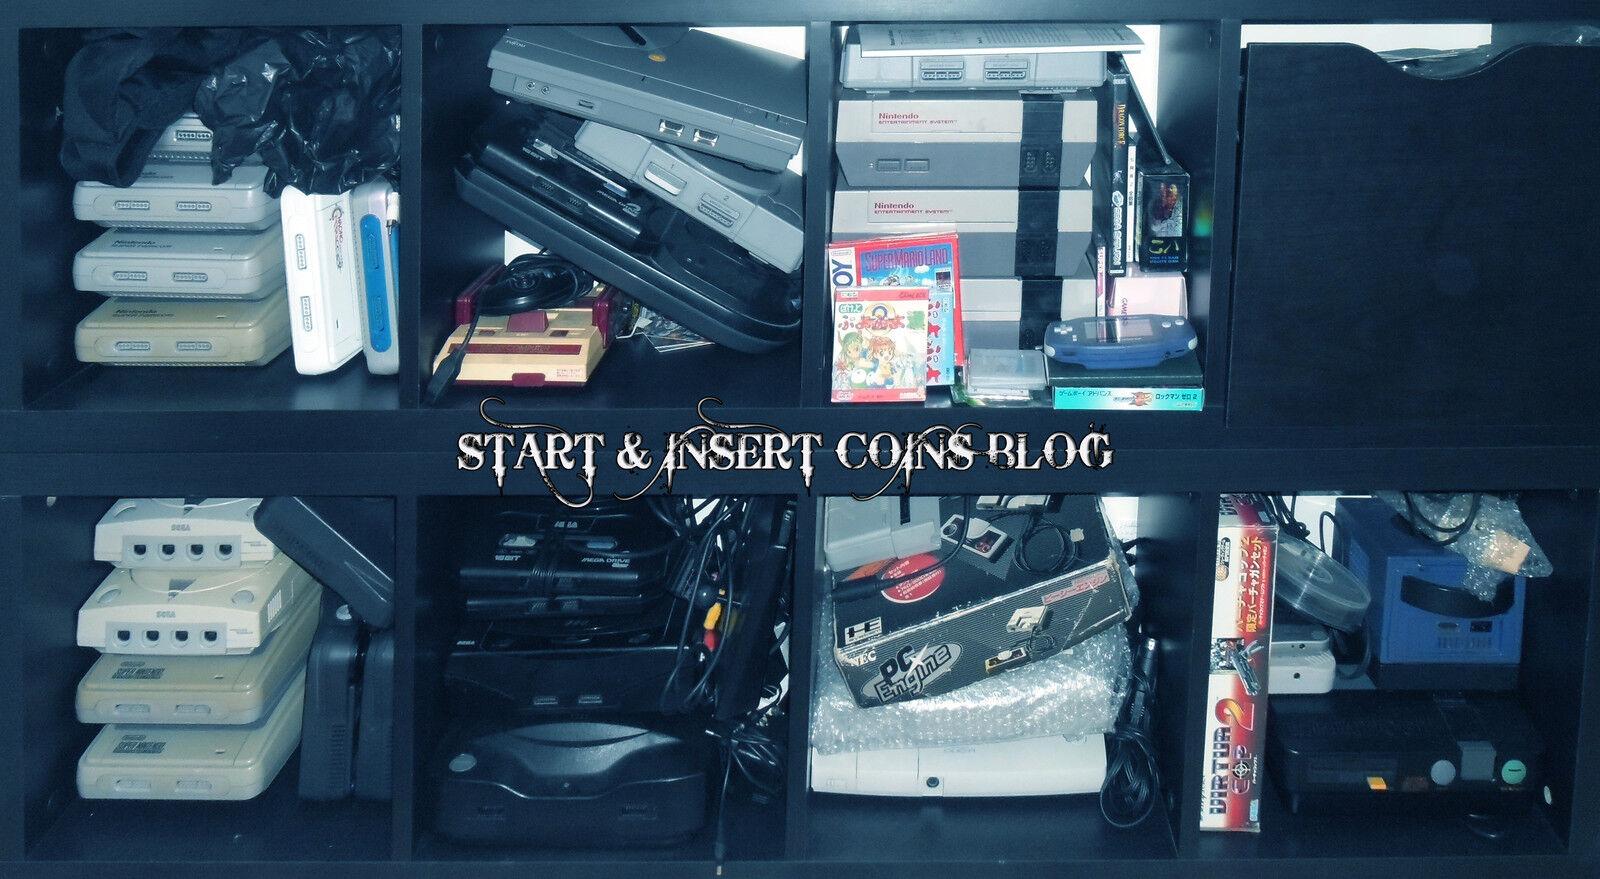 START&INSERTCOINS